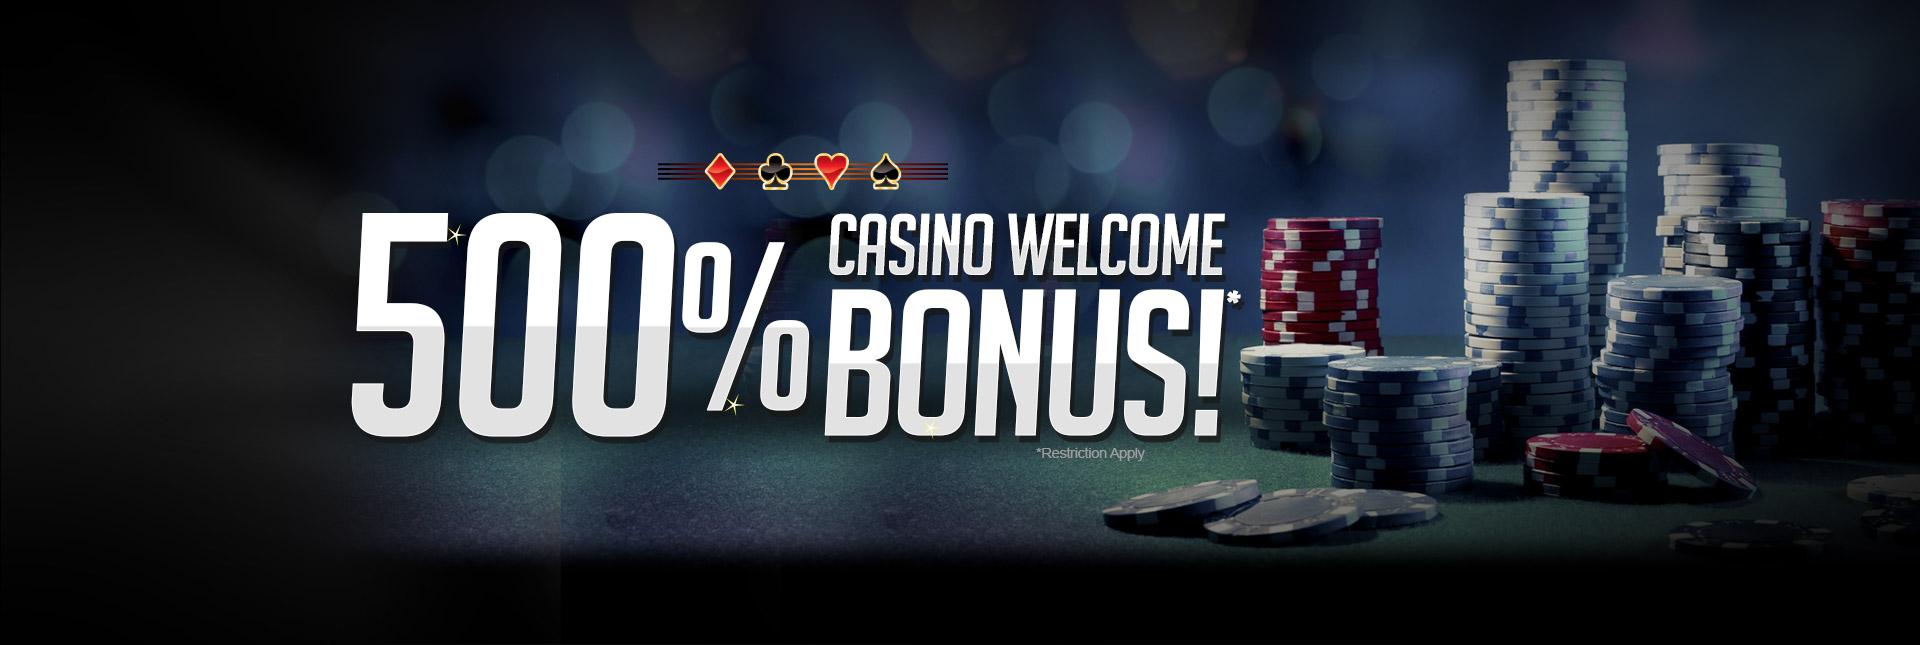 500% Casino Welcome Bonus!*